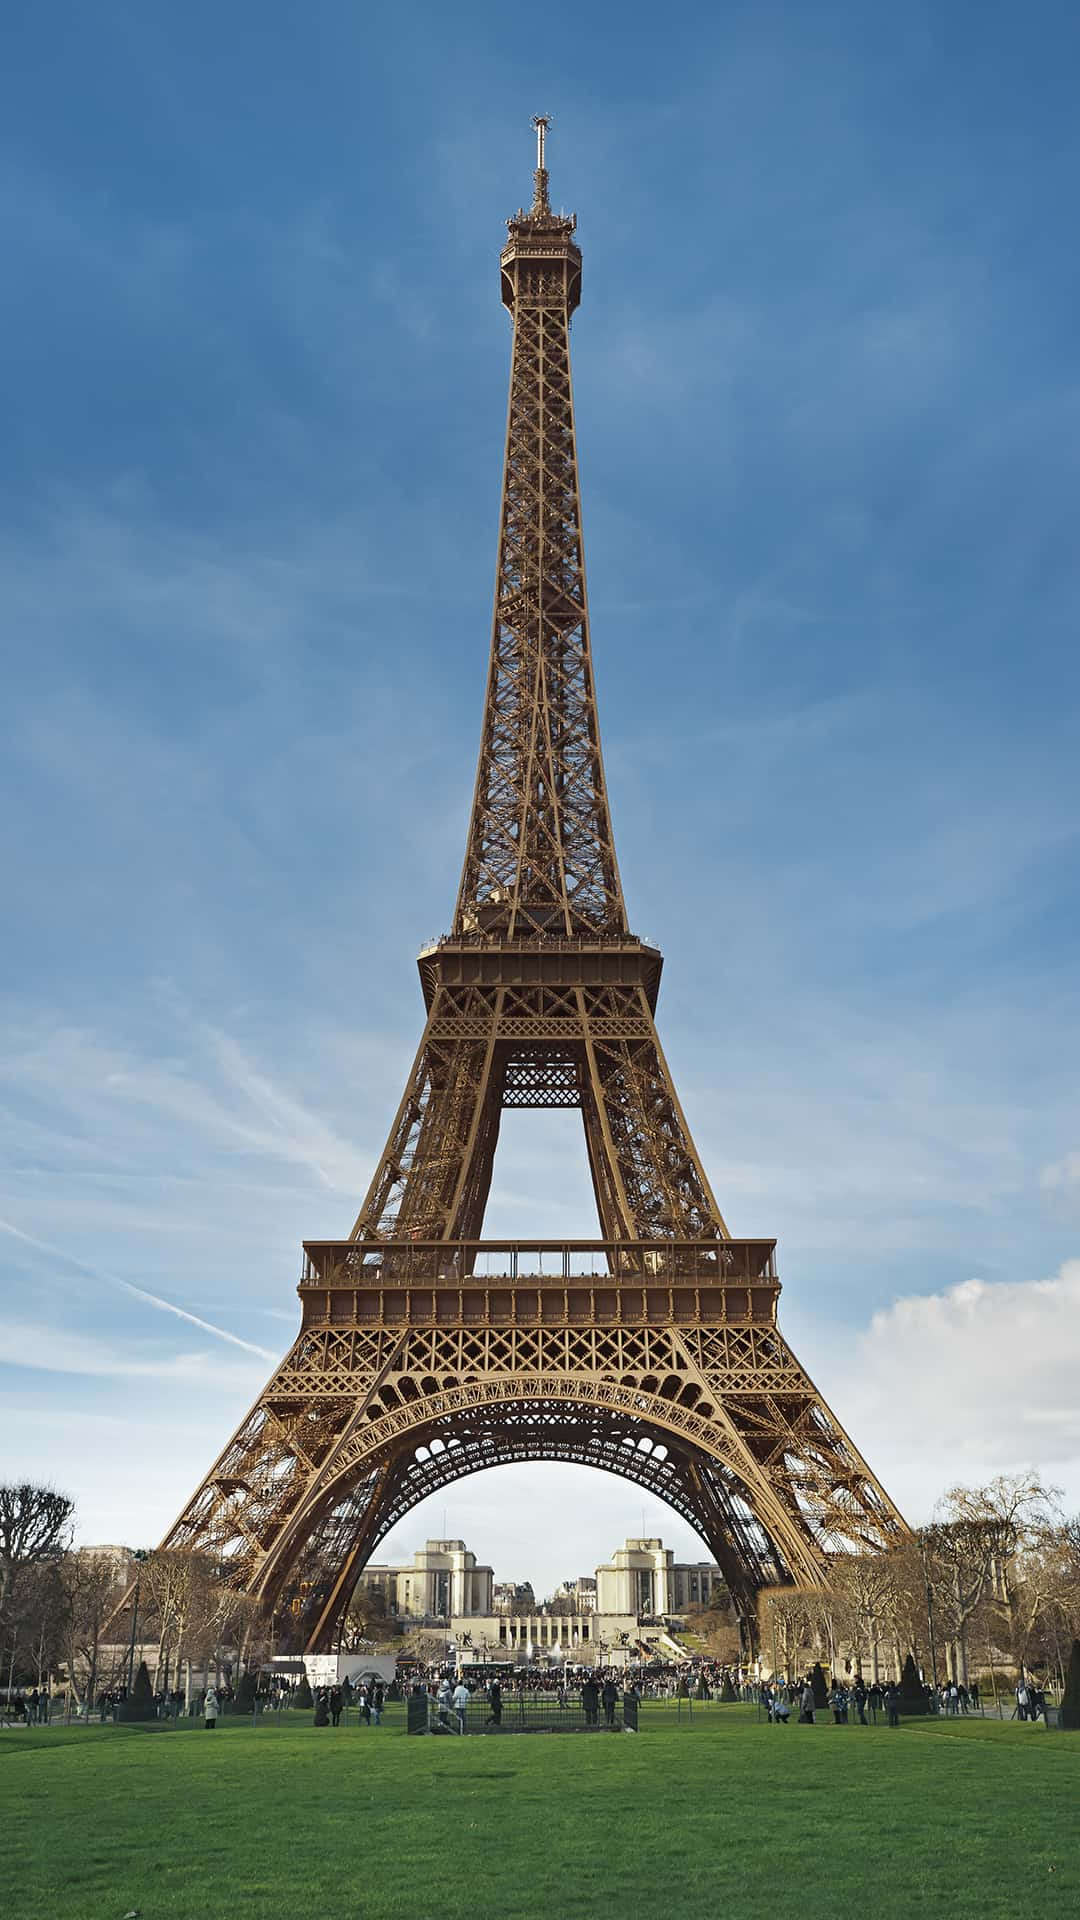 eiffel-tower-paris-france-blue-sky-android-wallpaper